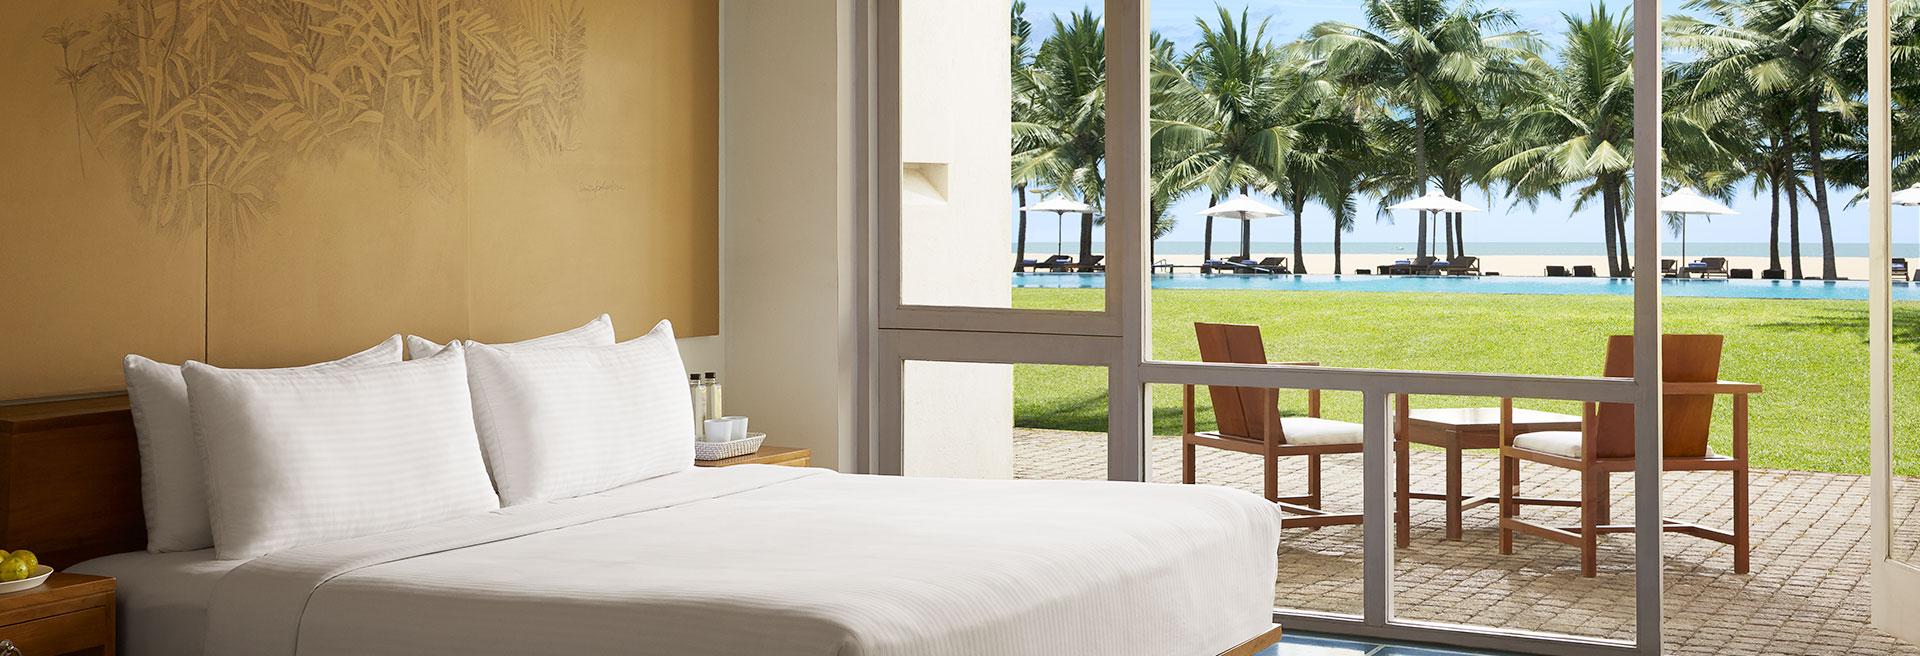 luxury deluxe room accommodation